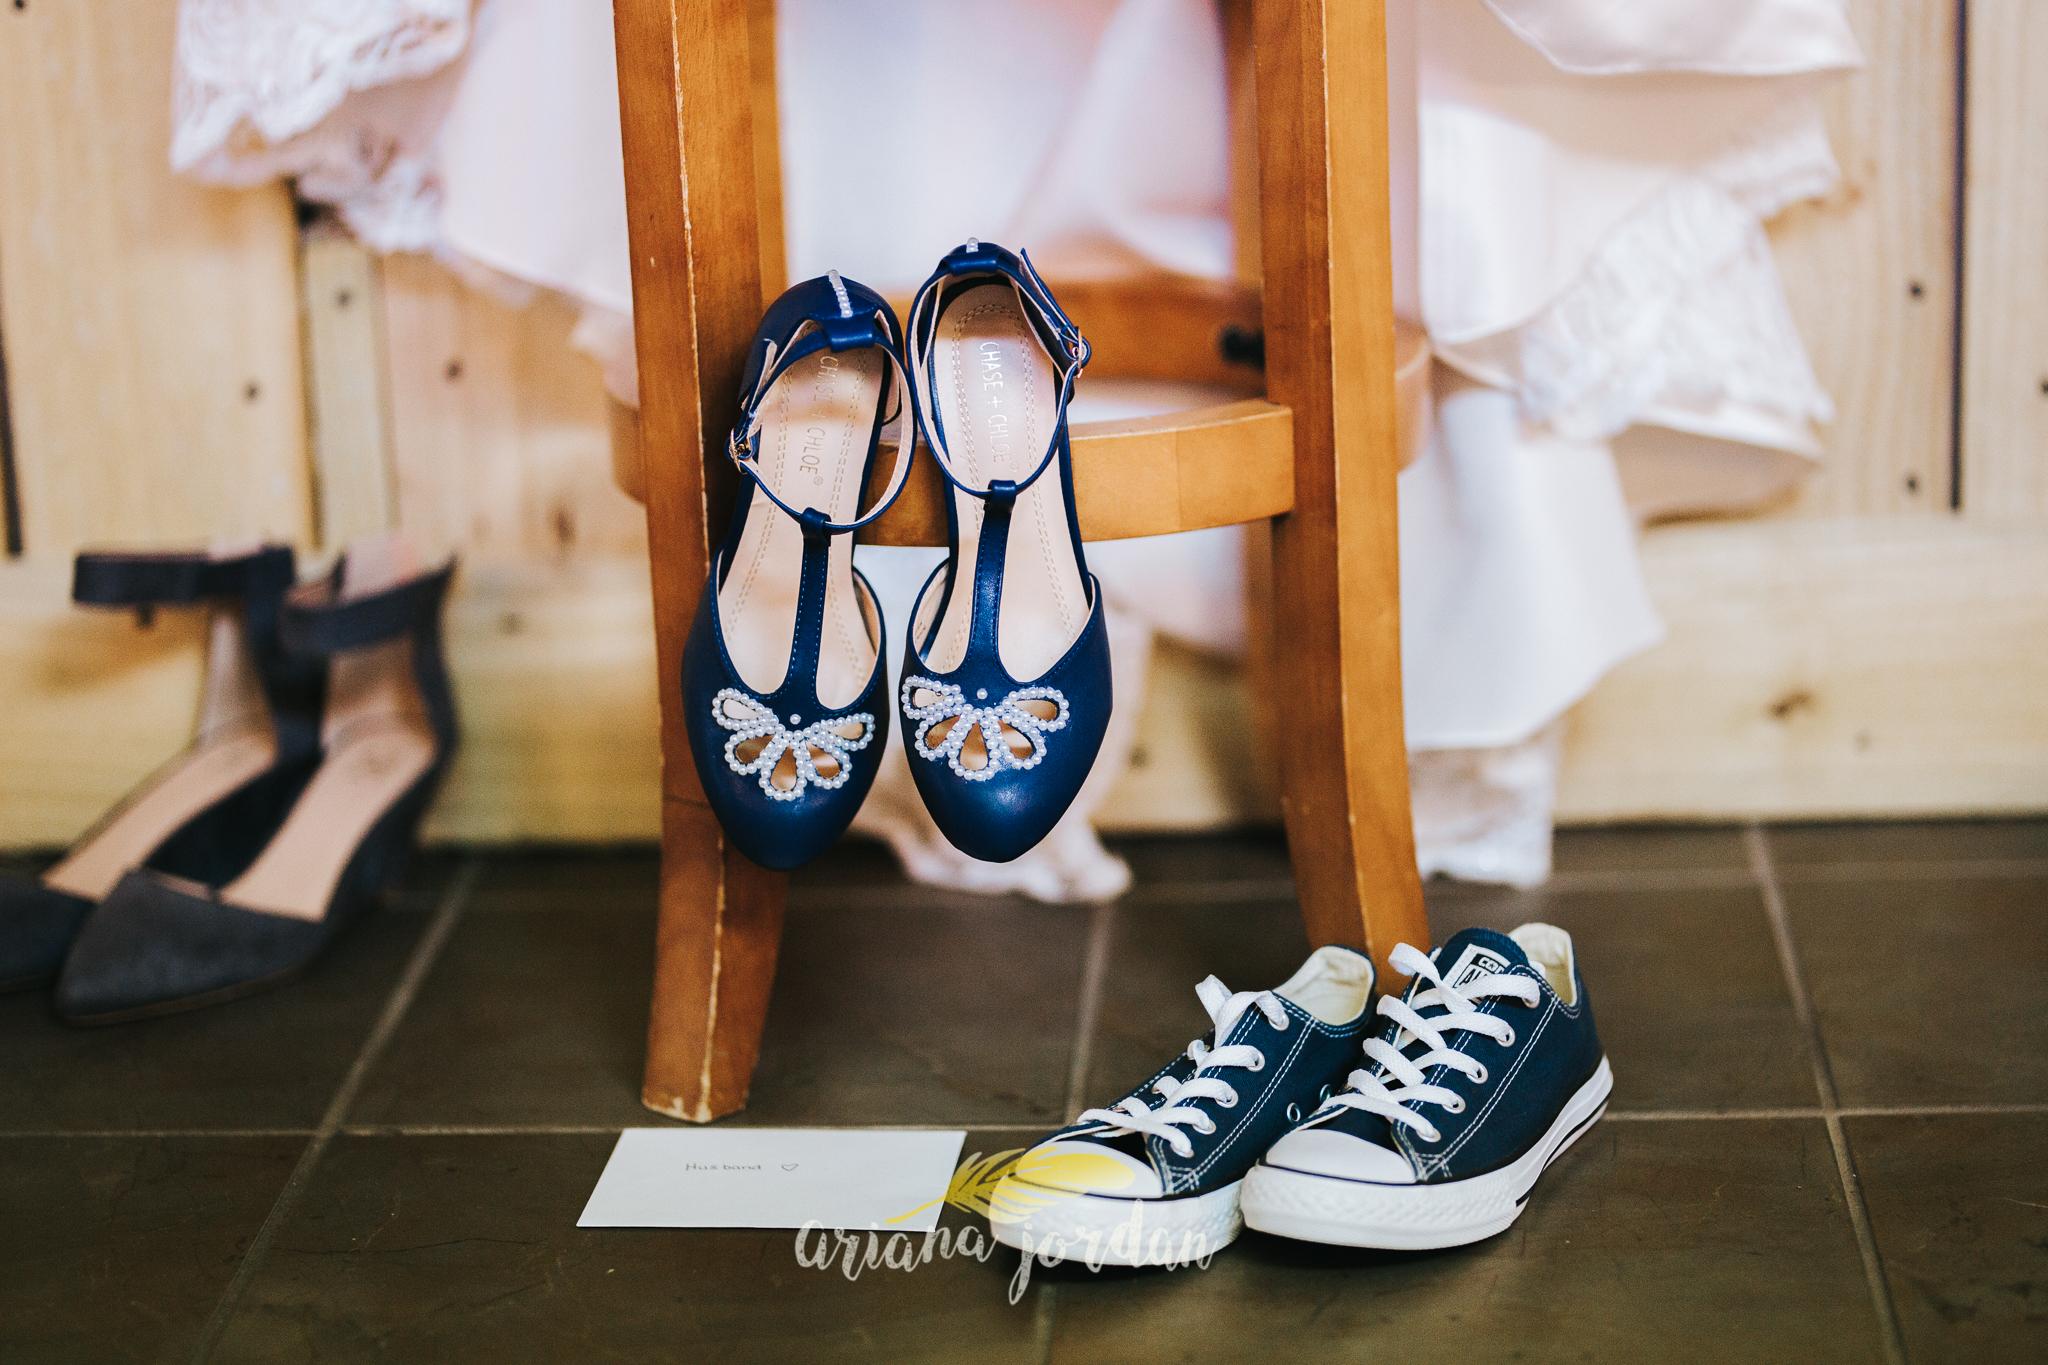 013 Ariana Jordan Photography -Moonlight Fields Lexington Ky Wedding Photographer 4087.jpg